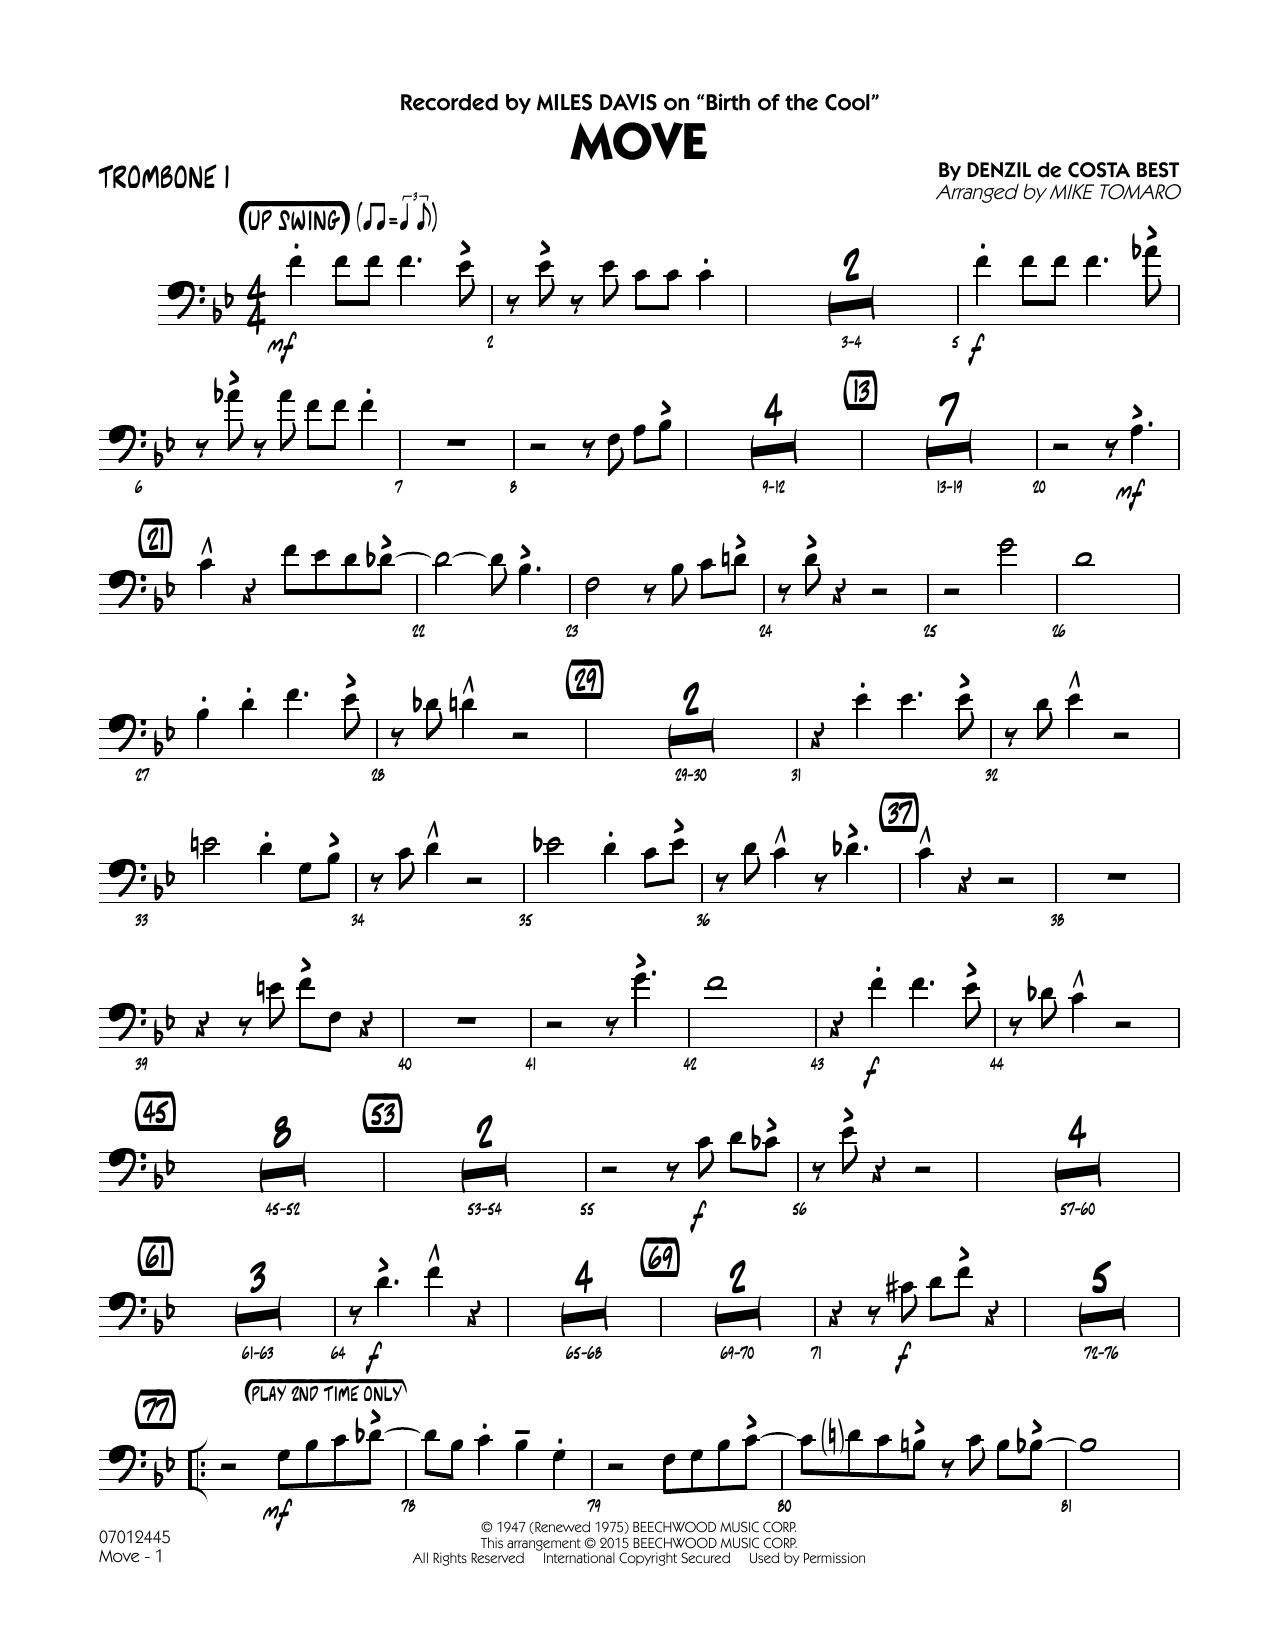 Sheet Music Digital Files To Print - Licensed Miles Davis